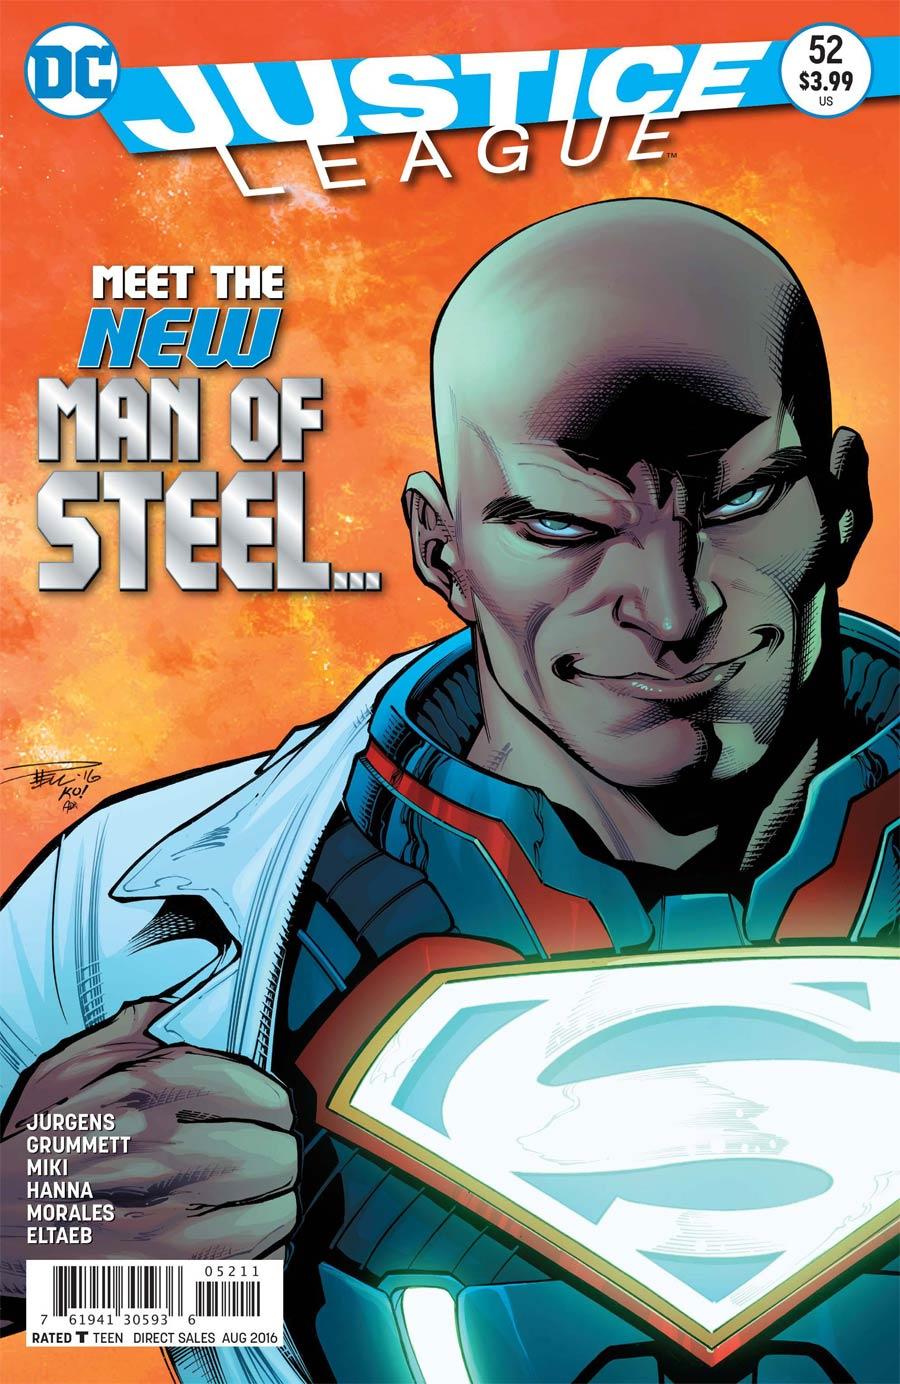 Justice League Vol 2 #52